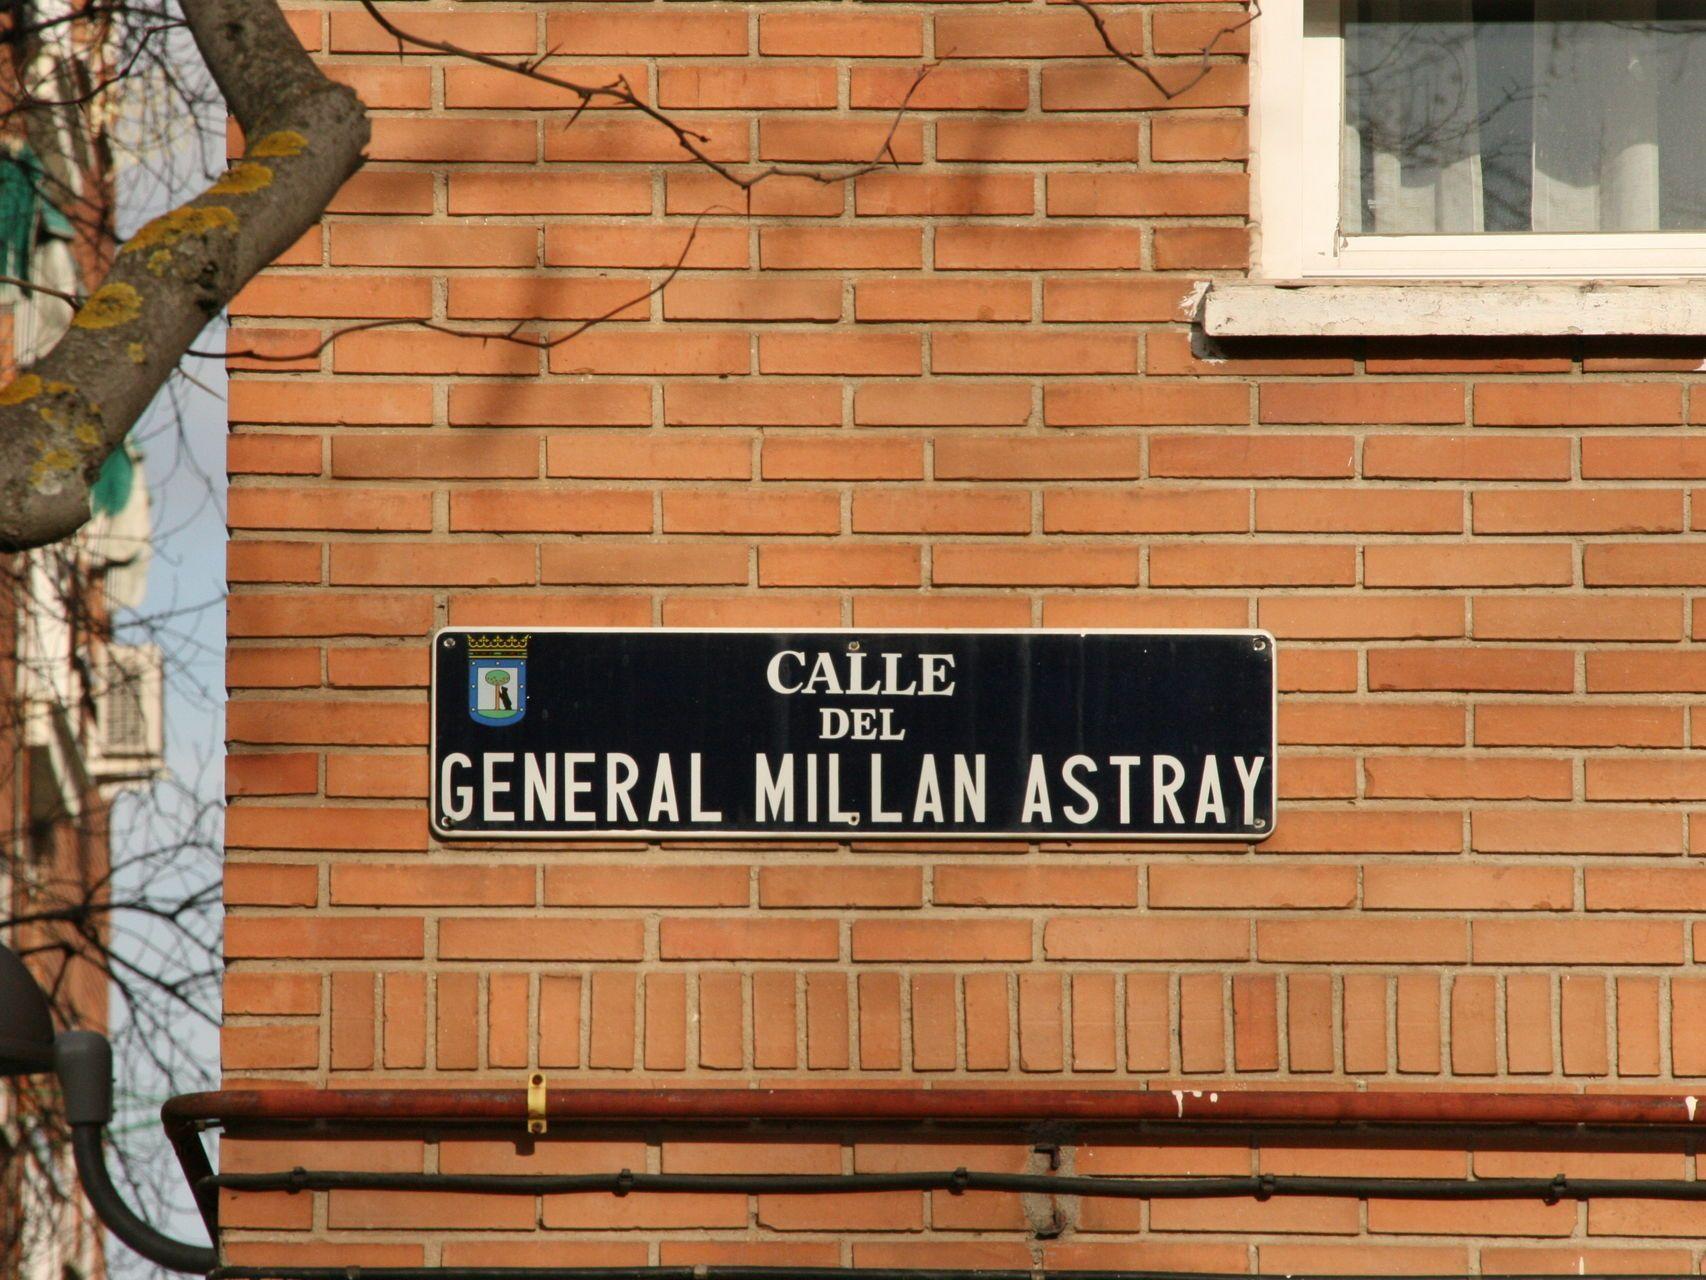 calle-general-millan-astray